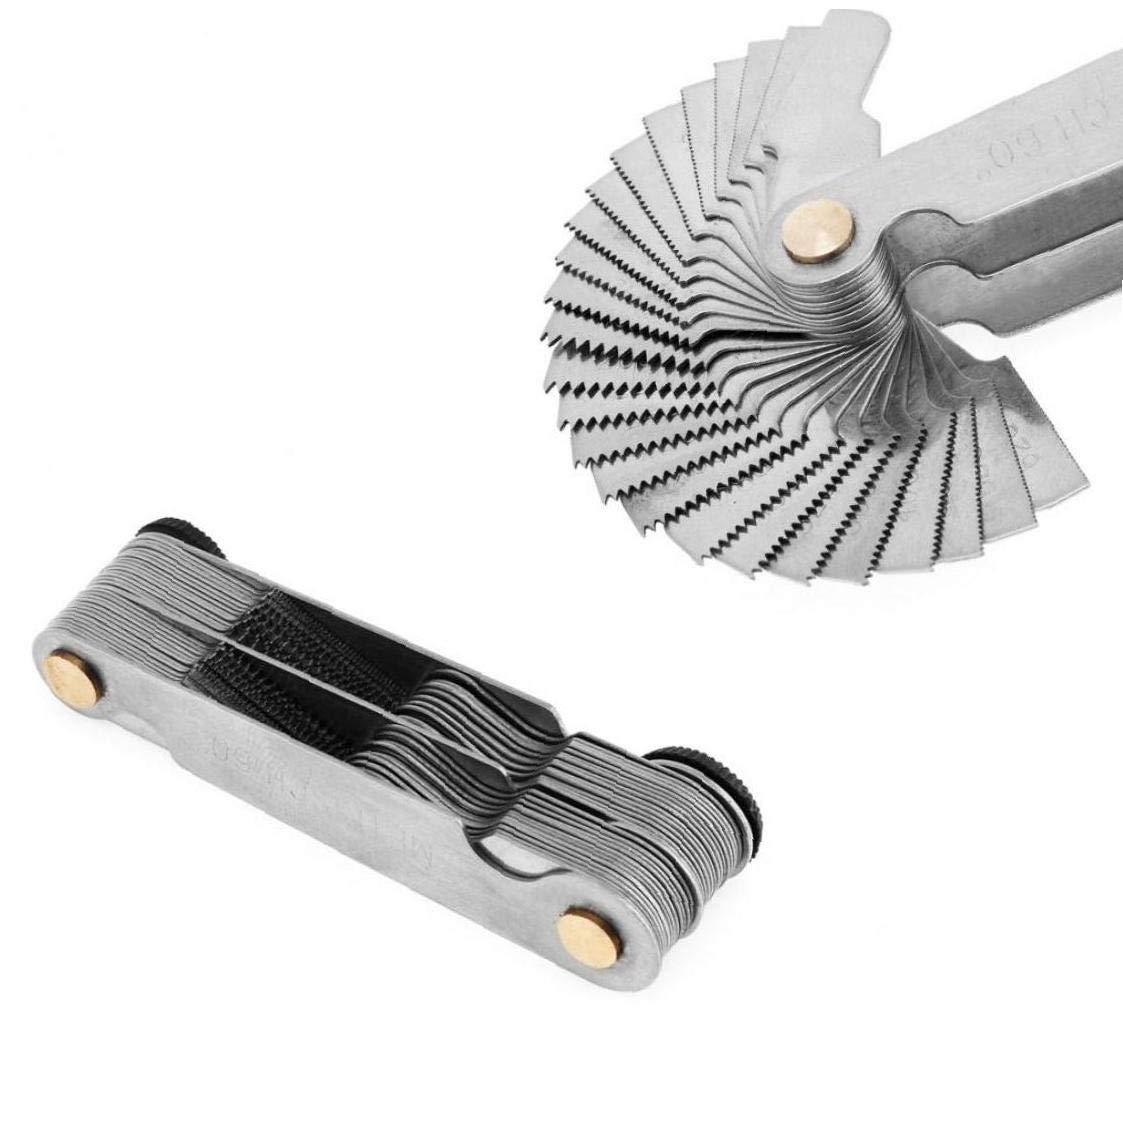 Angoter 1PCS Fixmee 20 Cuchillas Instrumentos de medici/ón medidores 1PCS 60 Grados Whitworth y 1PCS 60 Grados M/étricas Tornillo Rosca de Paso Mida Gage